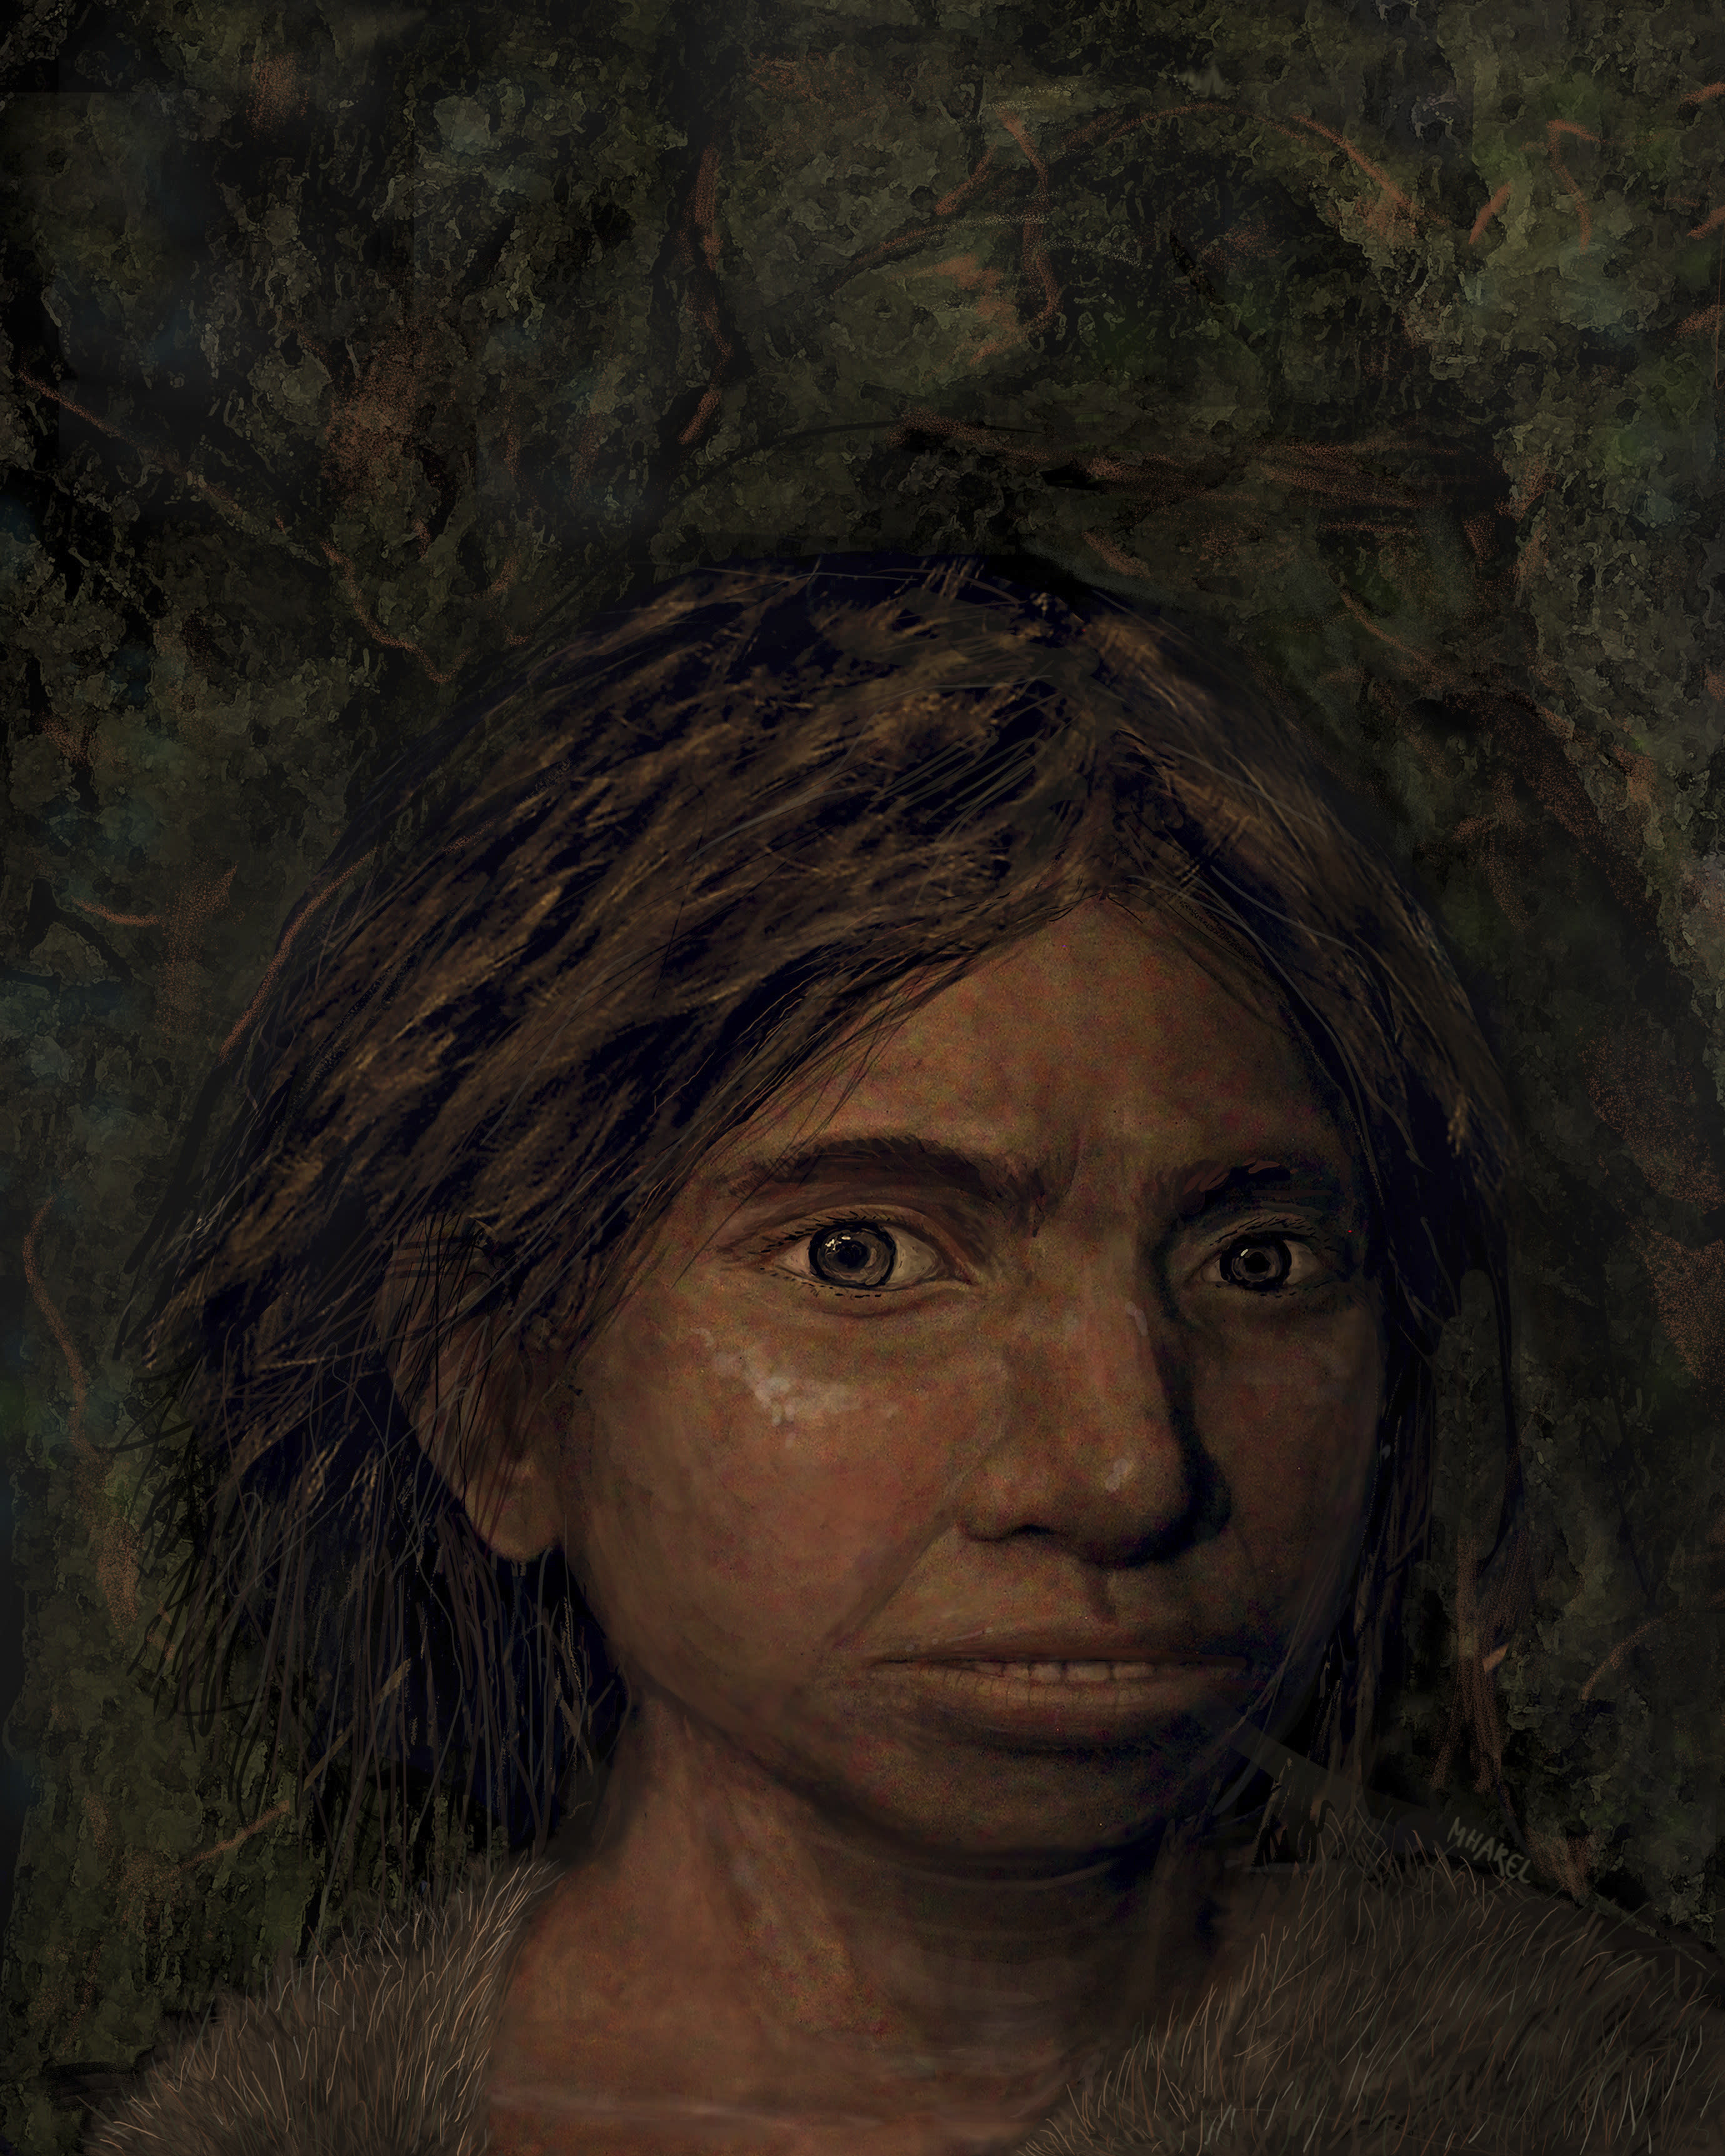 Scientists Reconstruct Skeletal Anatomy of Denisovans | Anatomy, Genetics, Paleoanthropology